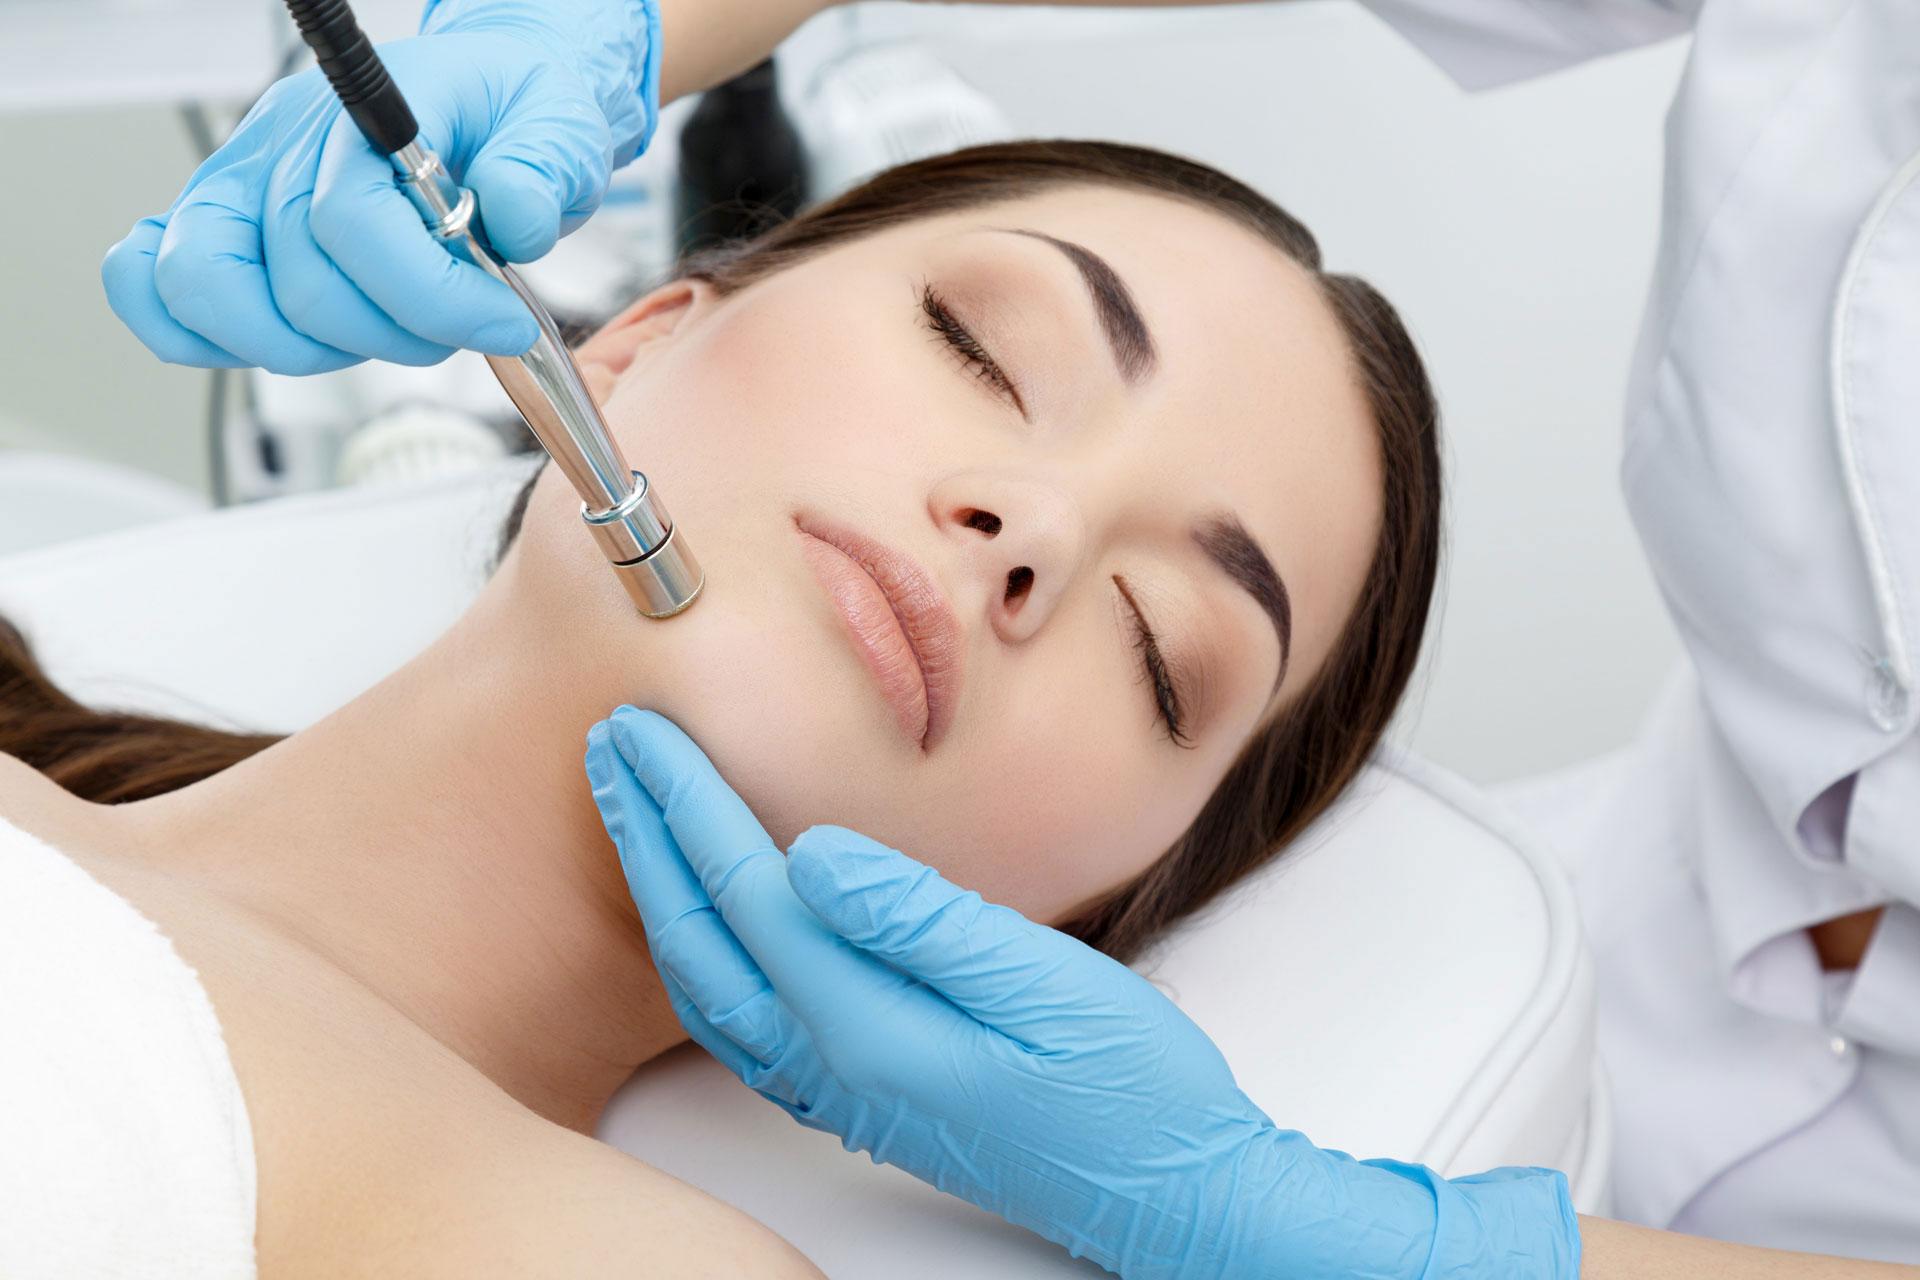 Best Skin Rejuvenation Medical Treatments in Orlando, Fl